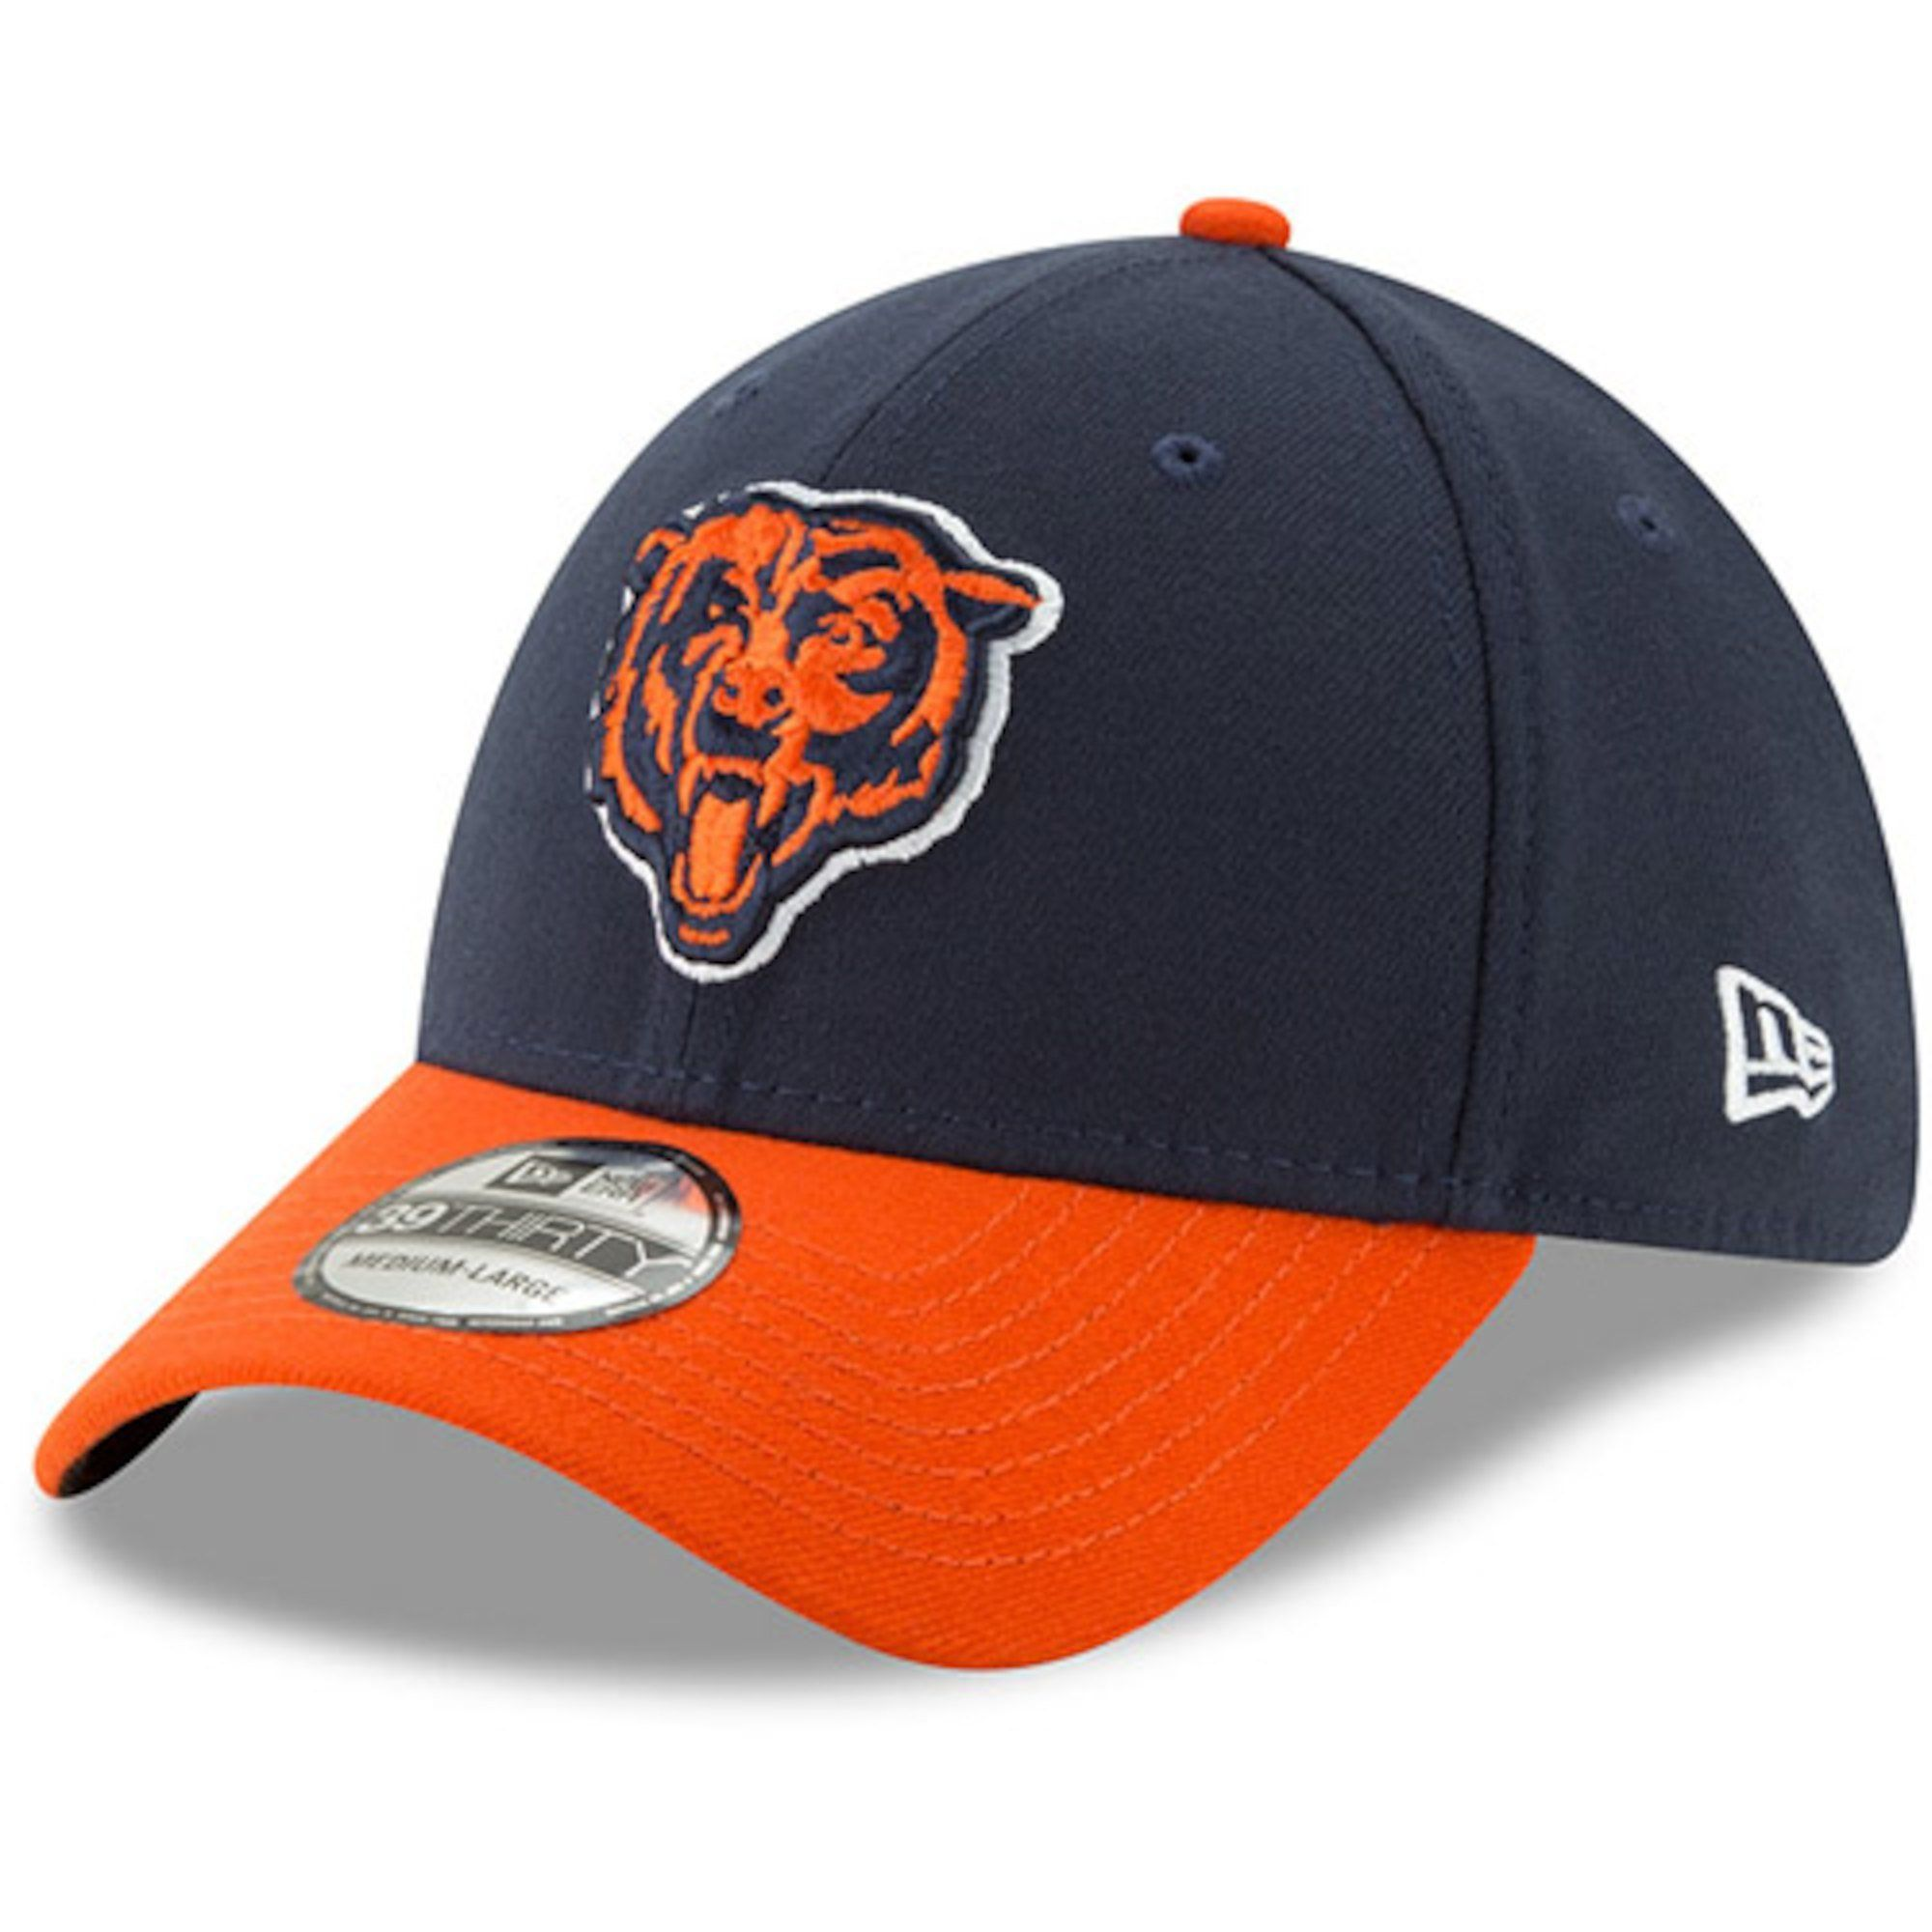 Chicago Bears New Era Team Classic Two-Tone 39THIRTY Flex Hat - Navy Orange 6052b0a86b82